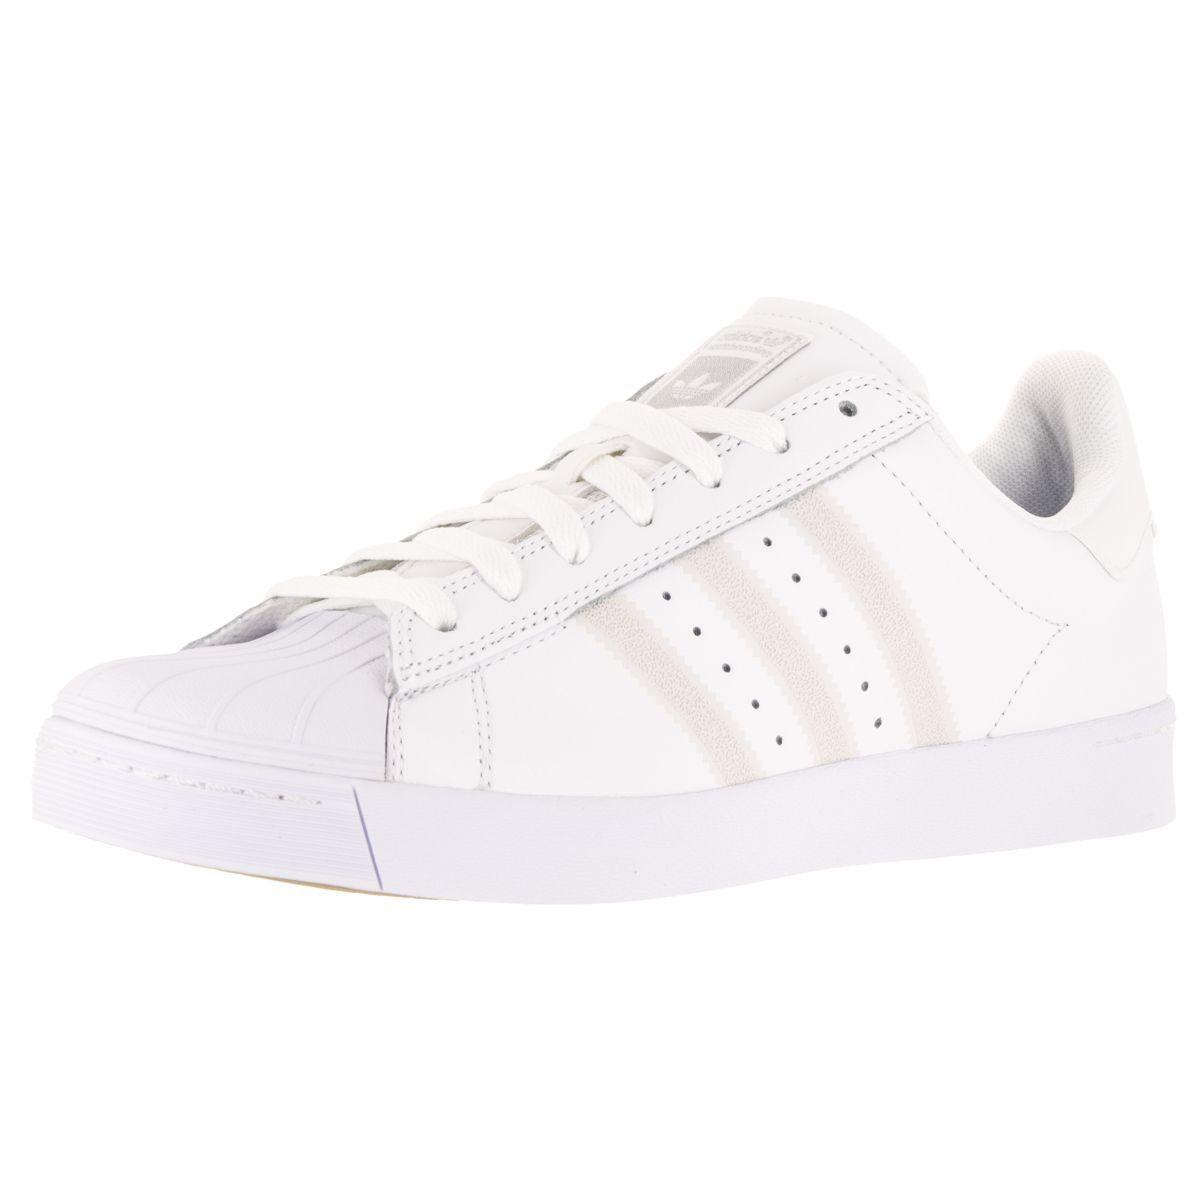 Adidas hombre 's Superstar Vulc / skate zapatos Adidas Superstars & Stan